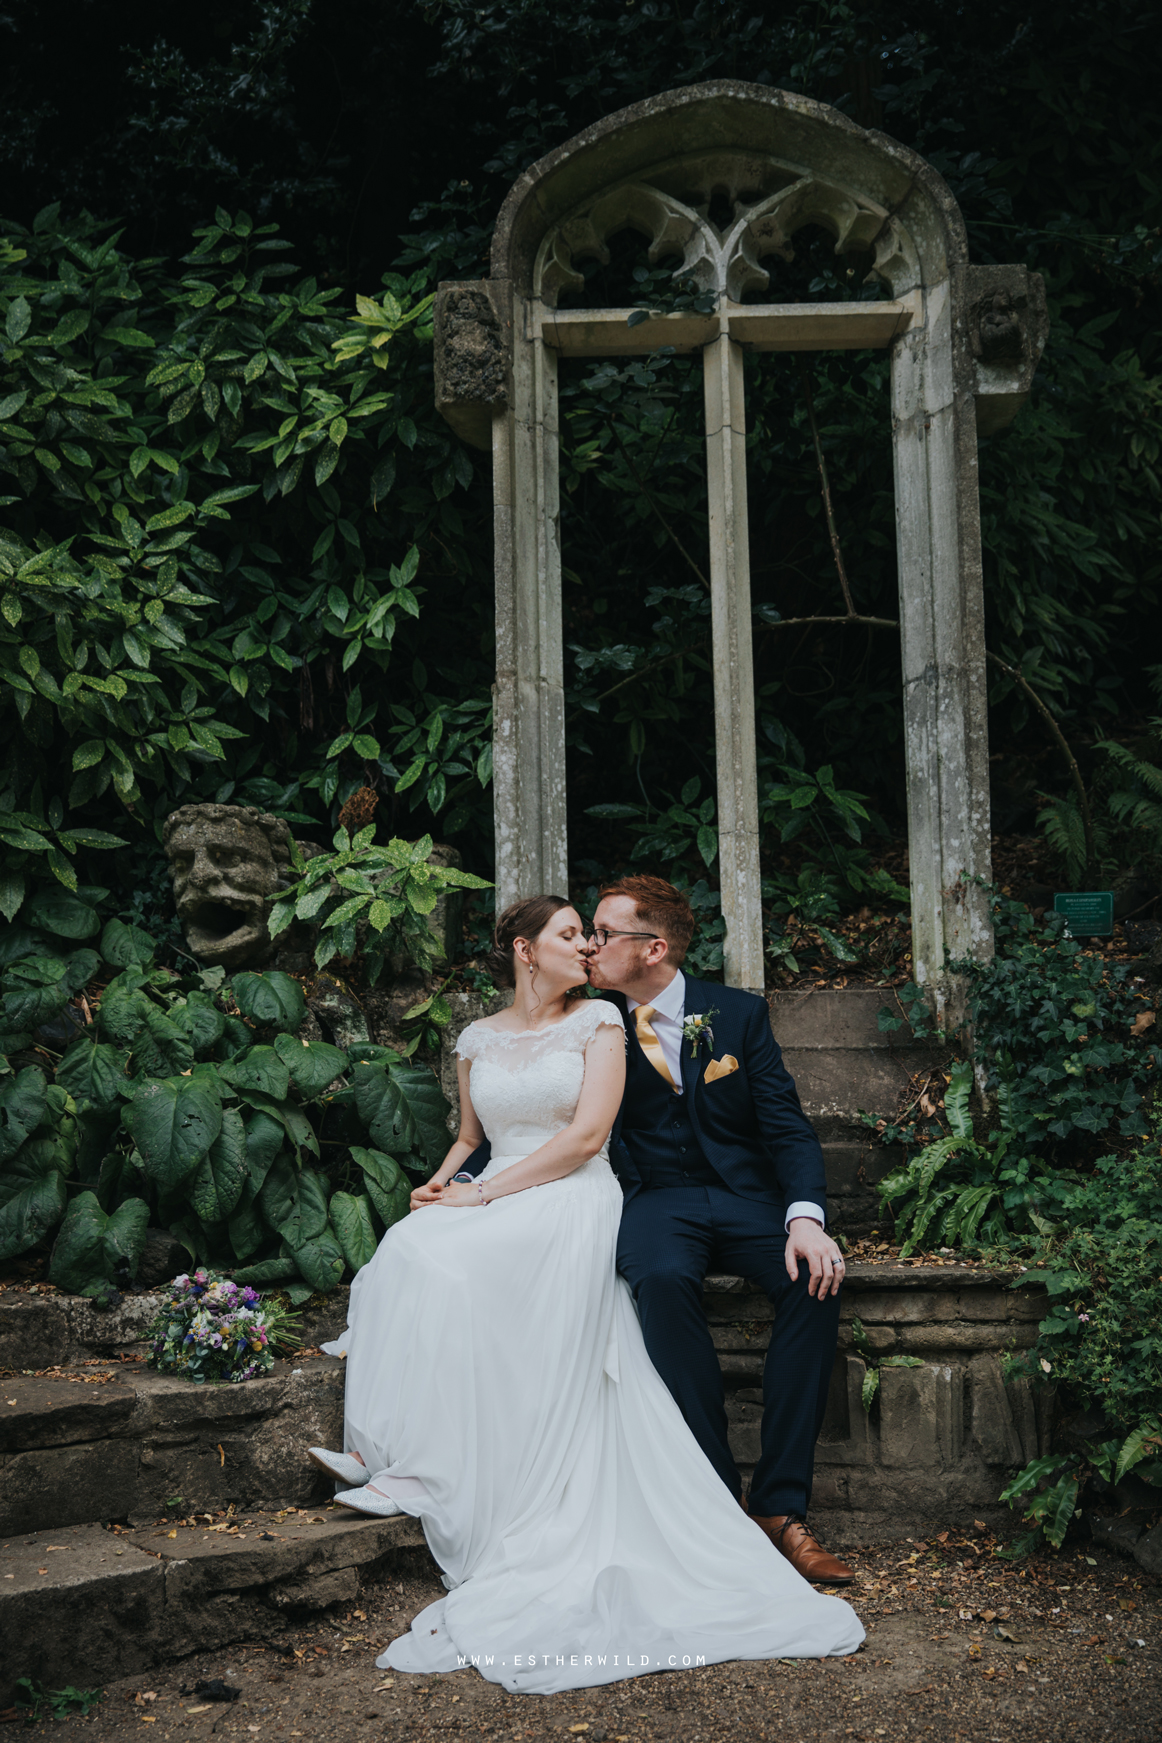 The_Georgian_Townhouse_Wedding_Norwich_Esther_Wild_Photographer_3R8A1784.jpg